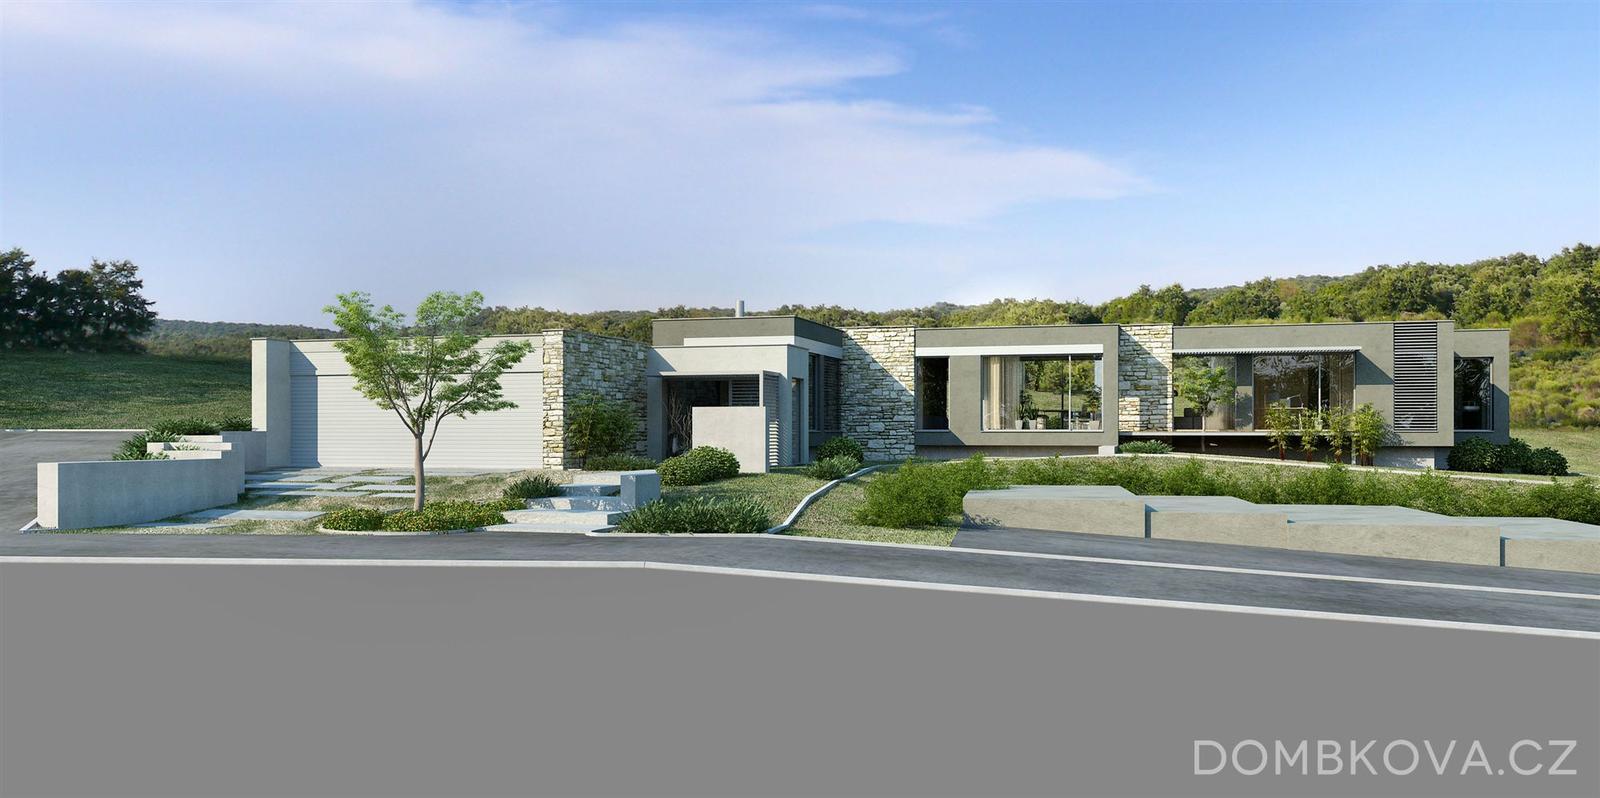 MIX resp. Páči sa mi :-* - Viac vizualizacii tohto nadherneho bungalovu tu: http://www.dombkova.cz/projekty/vizualizace/skorotice/